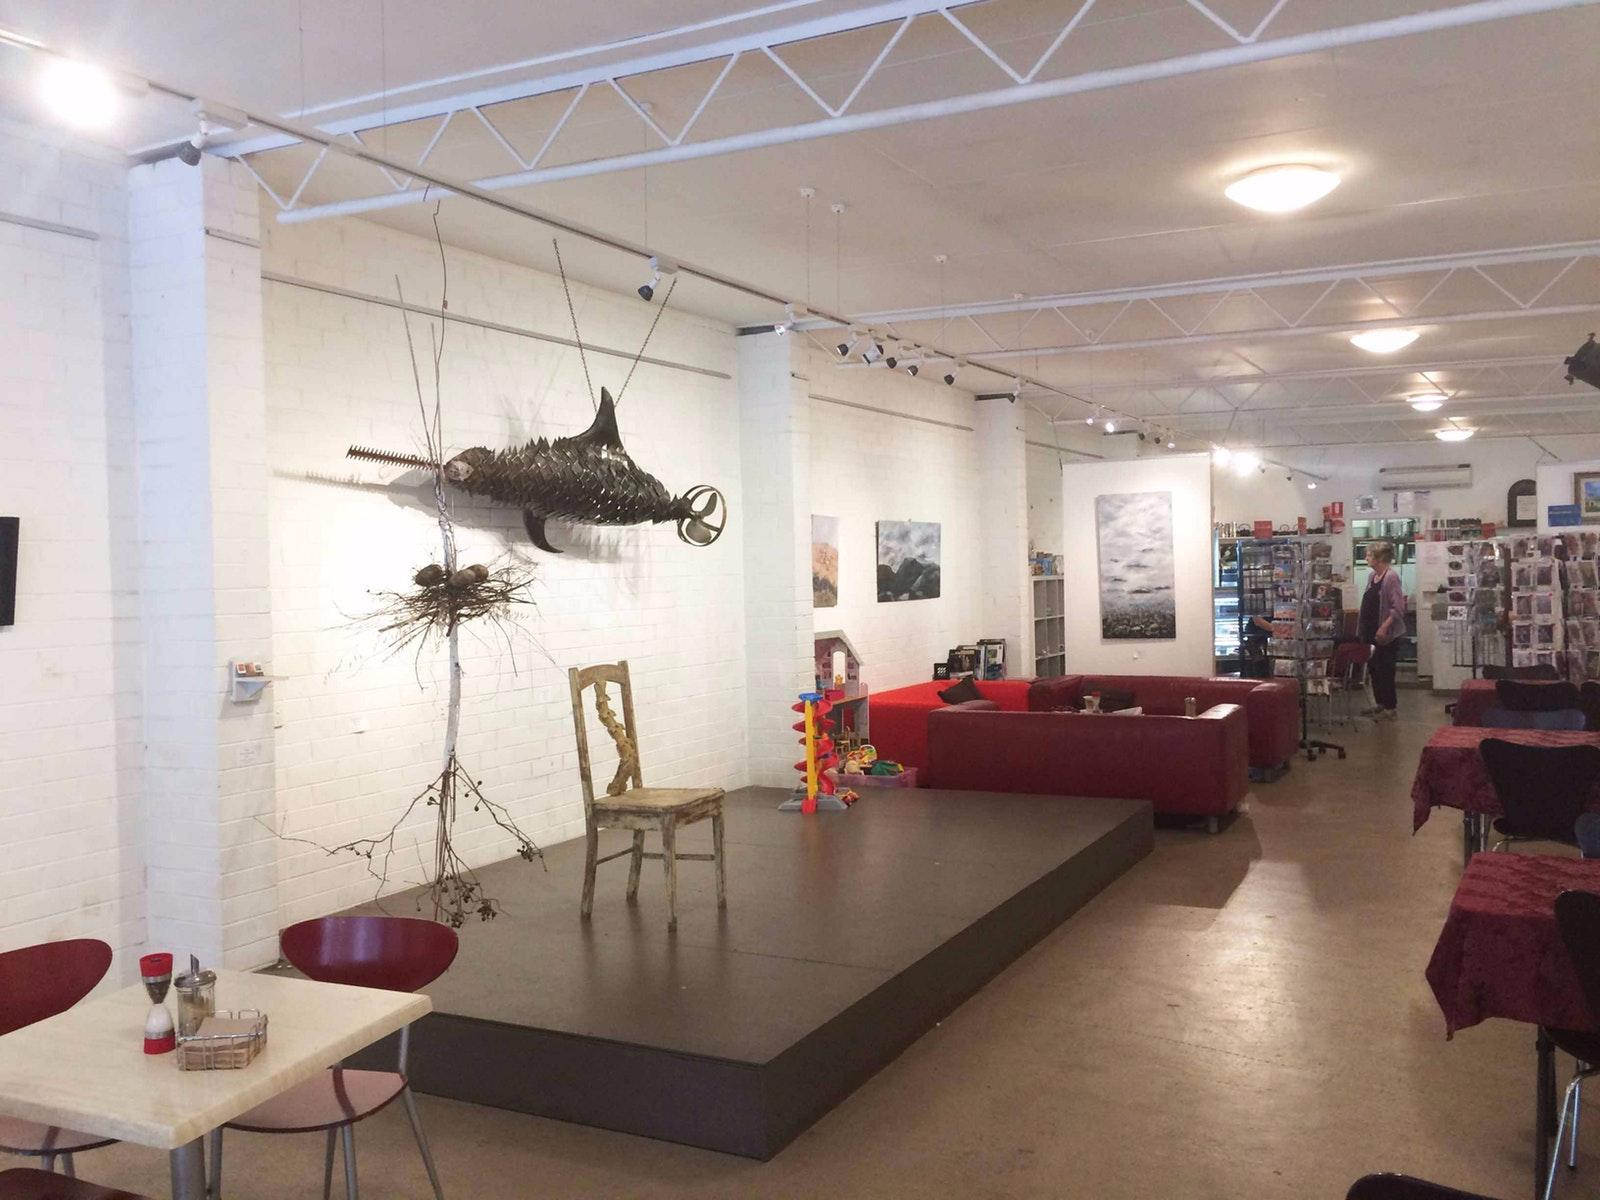 Metal sculpture inside gallery